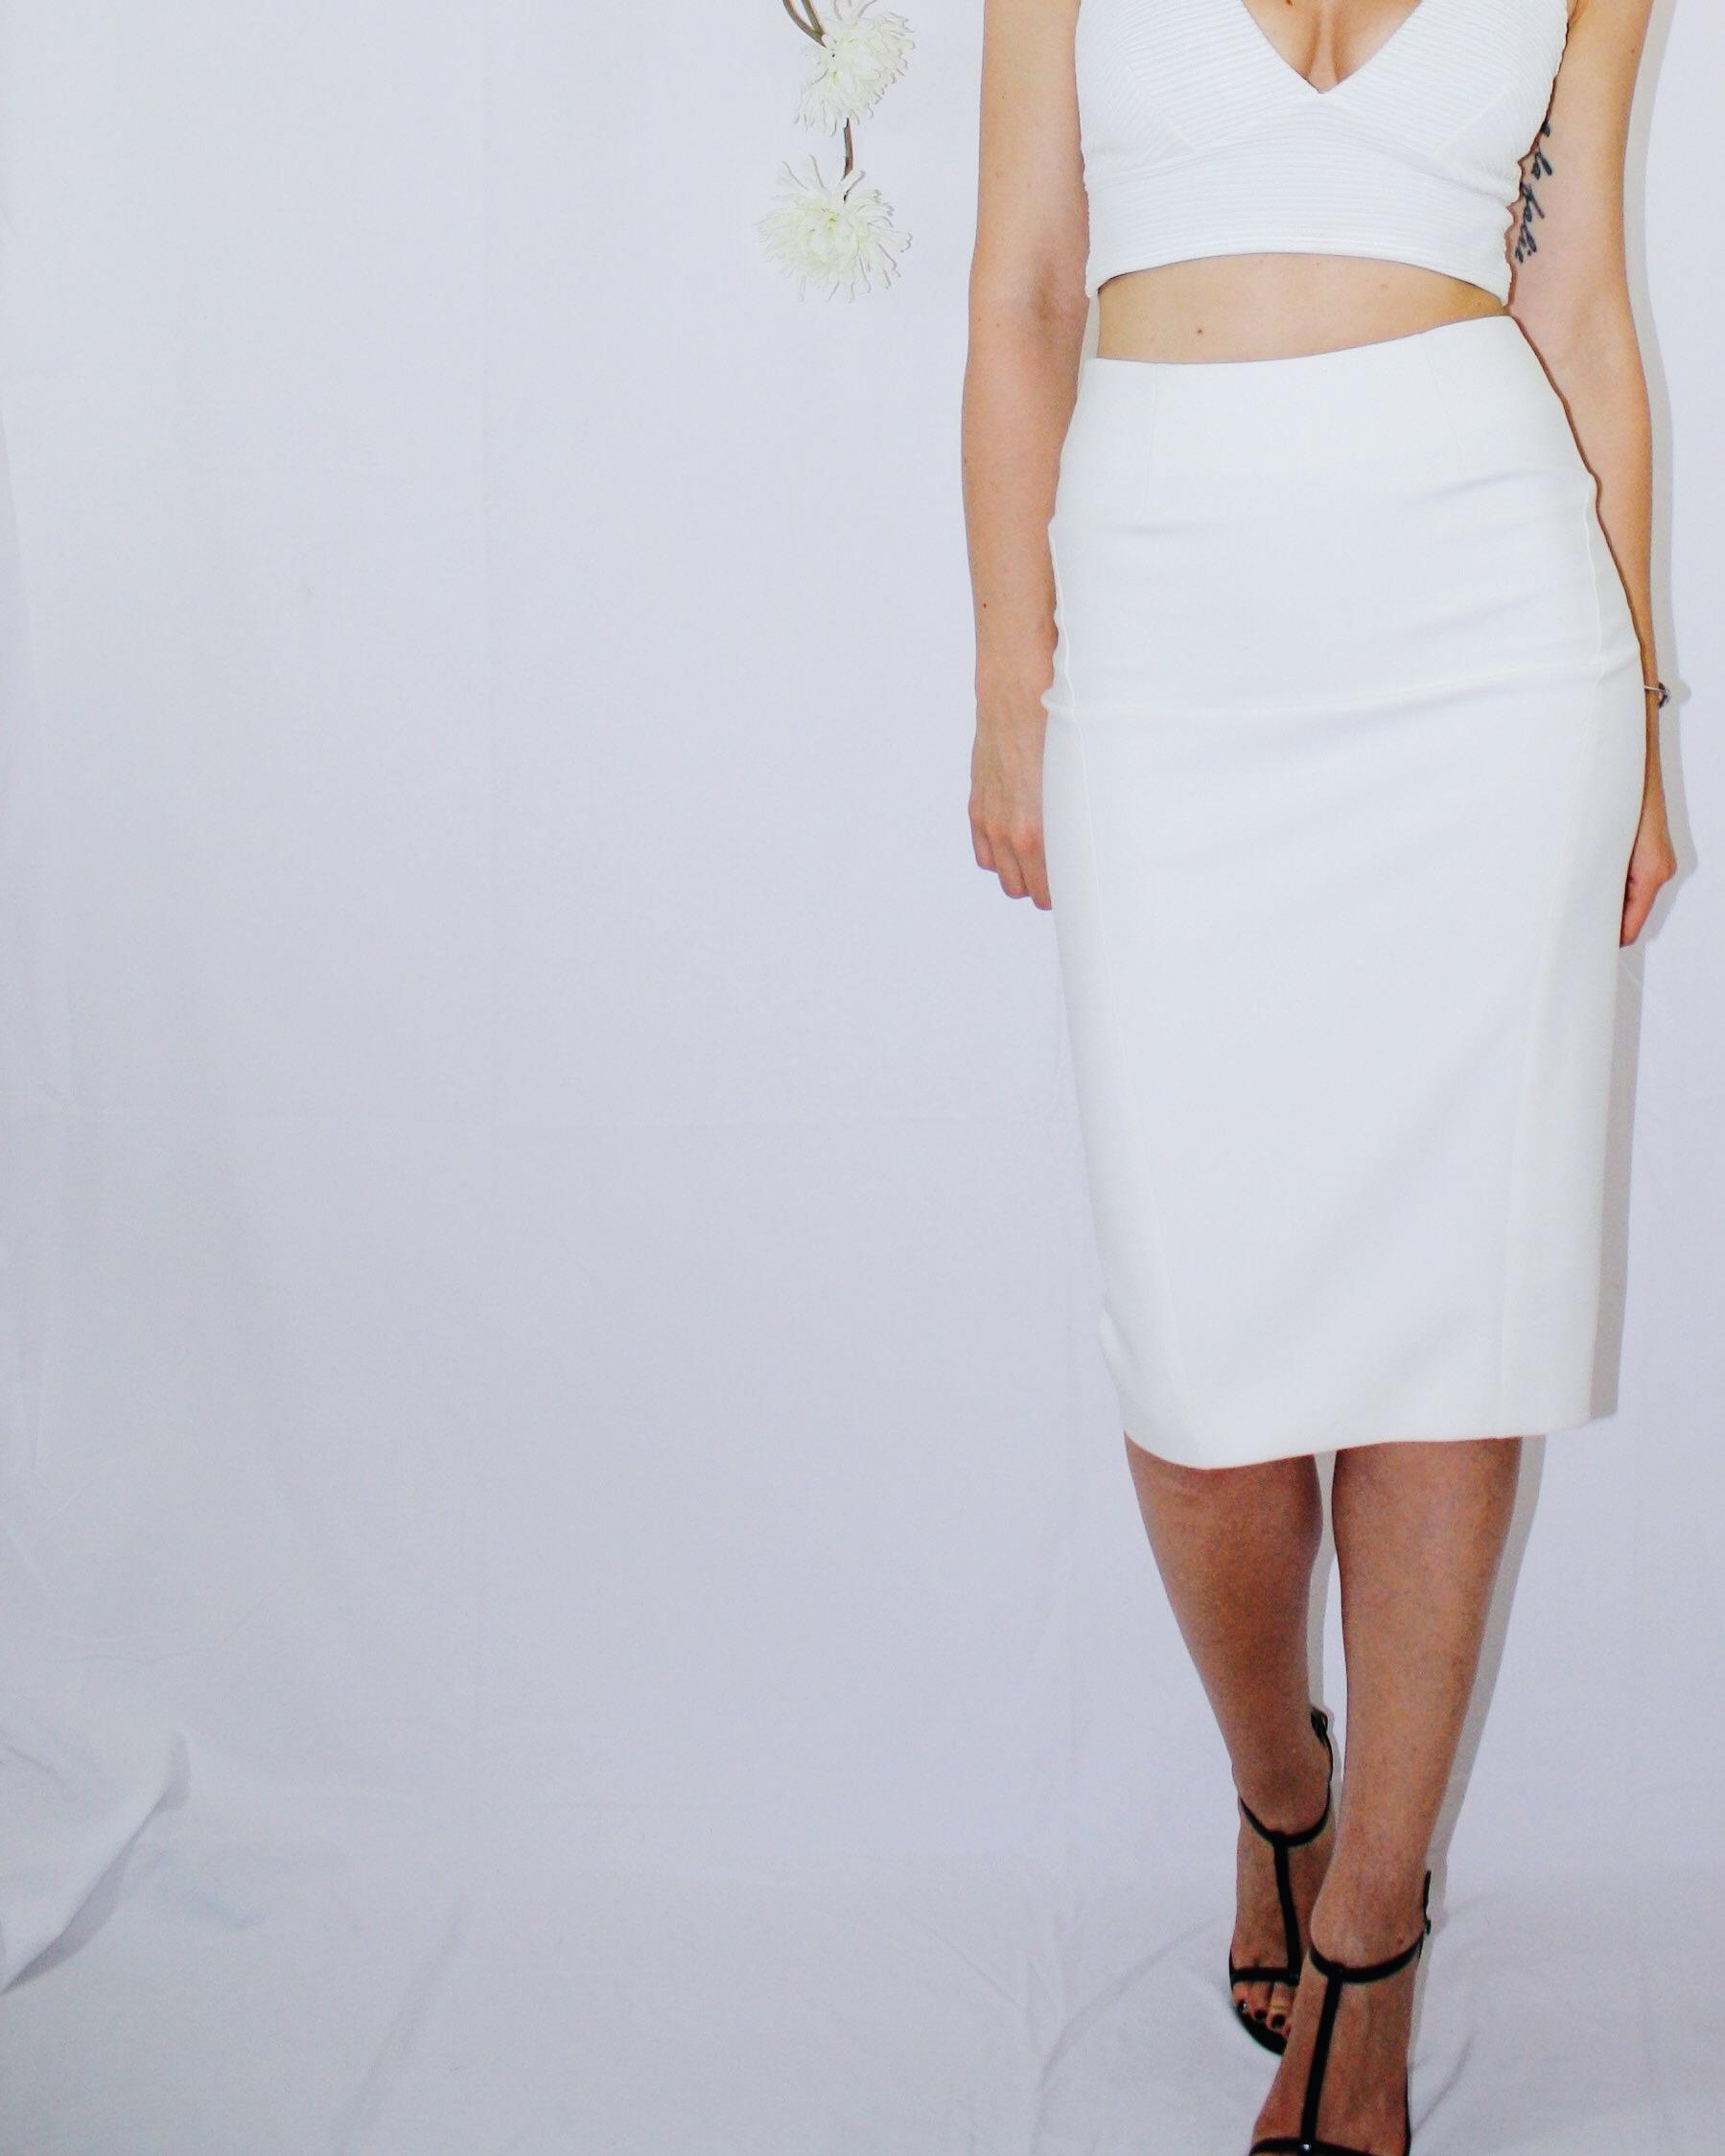 white skirt two ways elizabeth and james vintage second hand missguided crop top bag zipper black sandal dior dolce gabbana 3